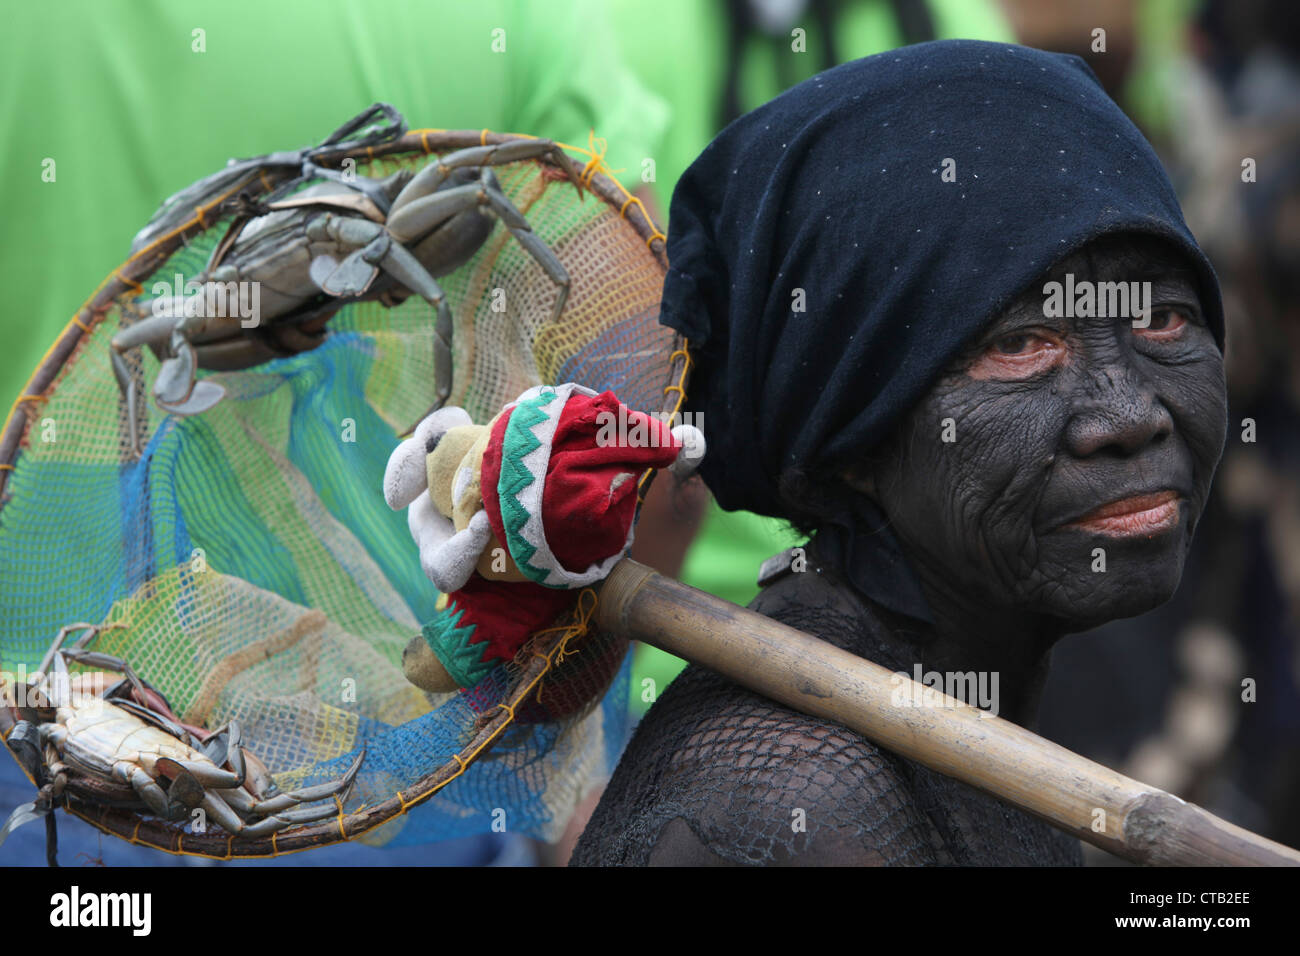 Woman with facial painting holding offerings at Ati Atihan festival, Ibajay, Aklan, Panay Island, Visayas, Philippines - Stock Image